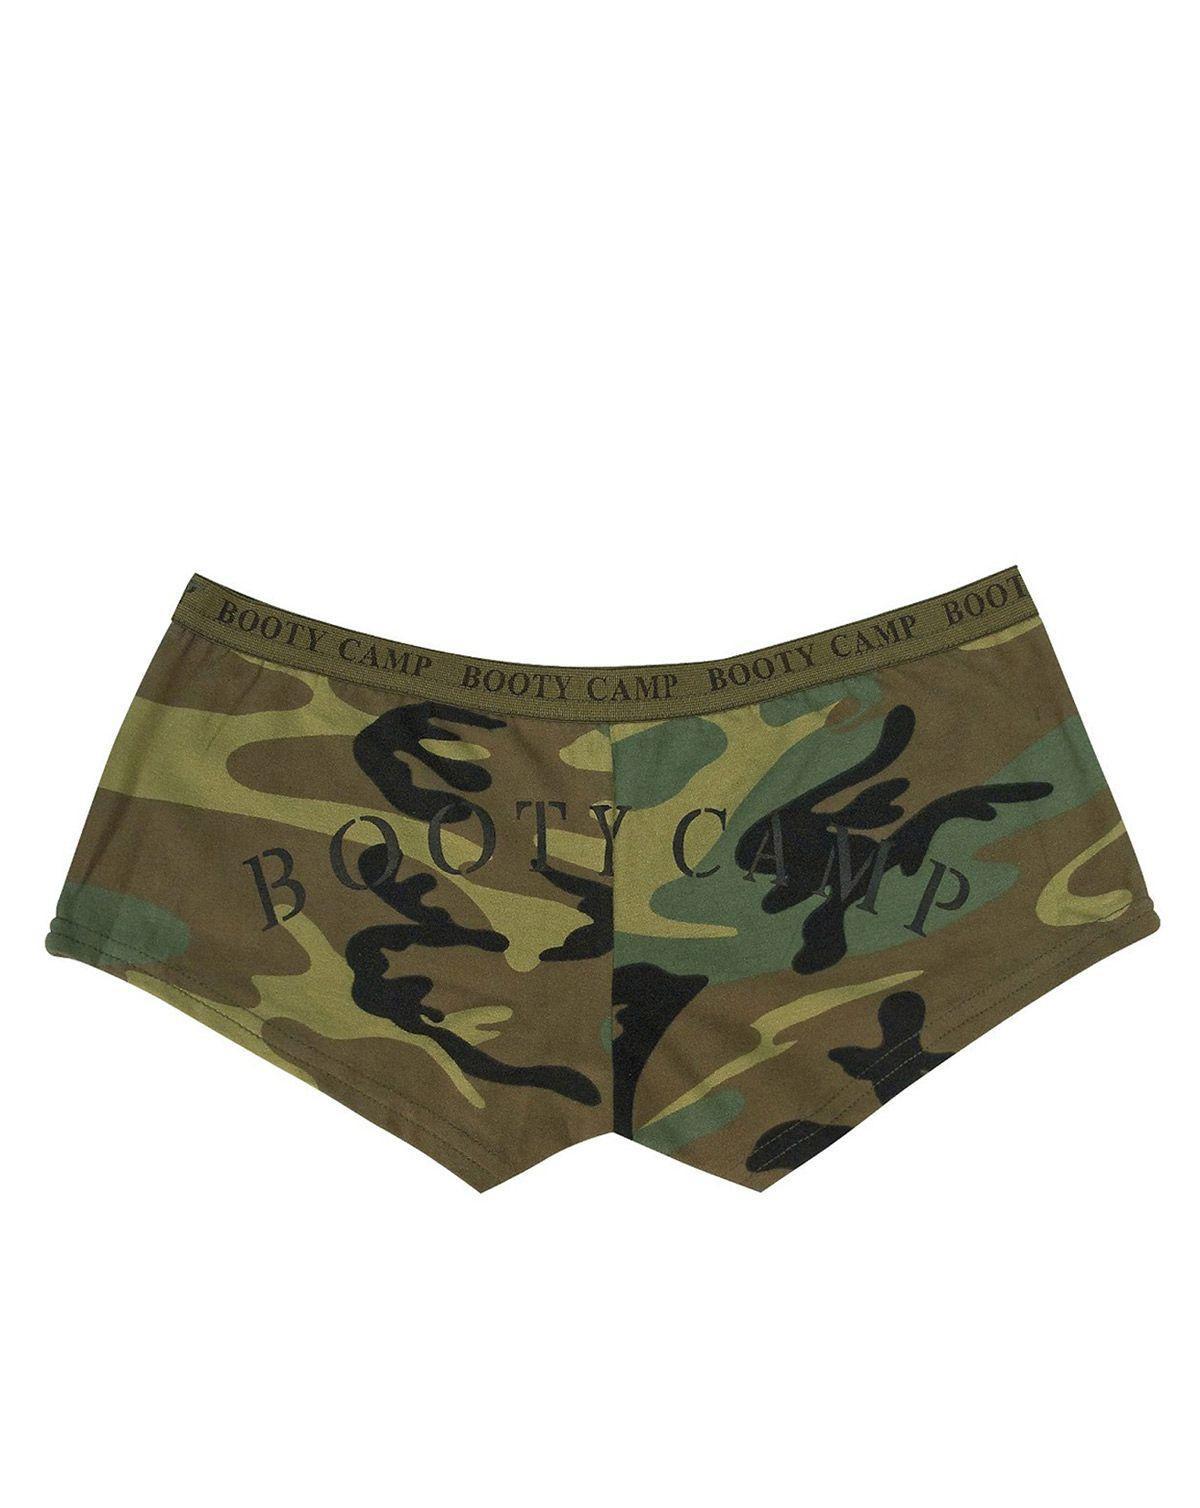 Image of   Rothco Booty Shorts 1 (Woodland, 2XL)